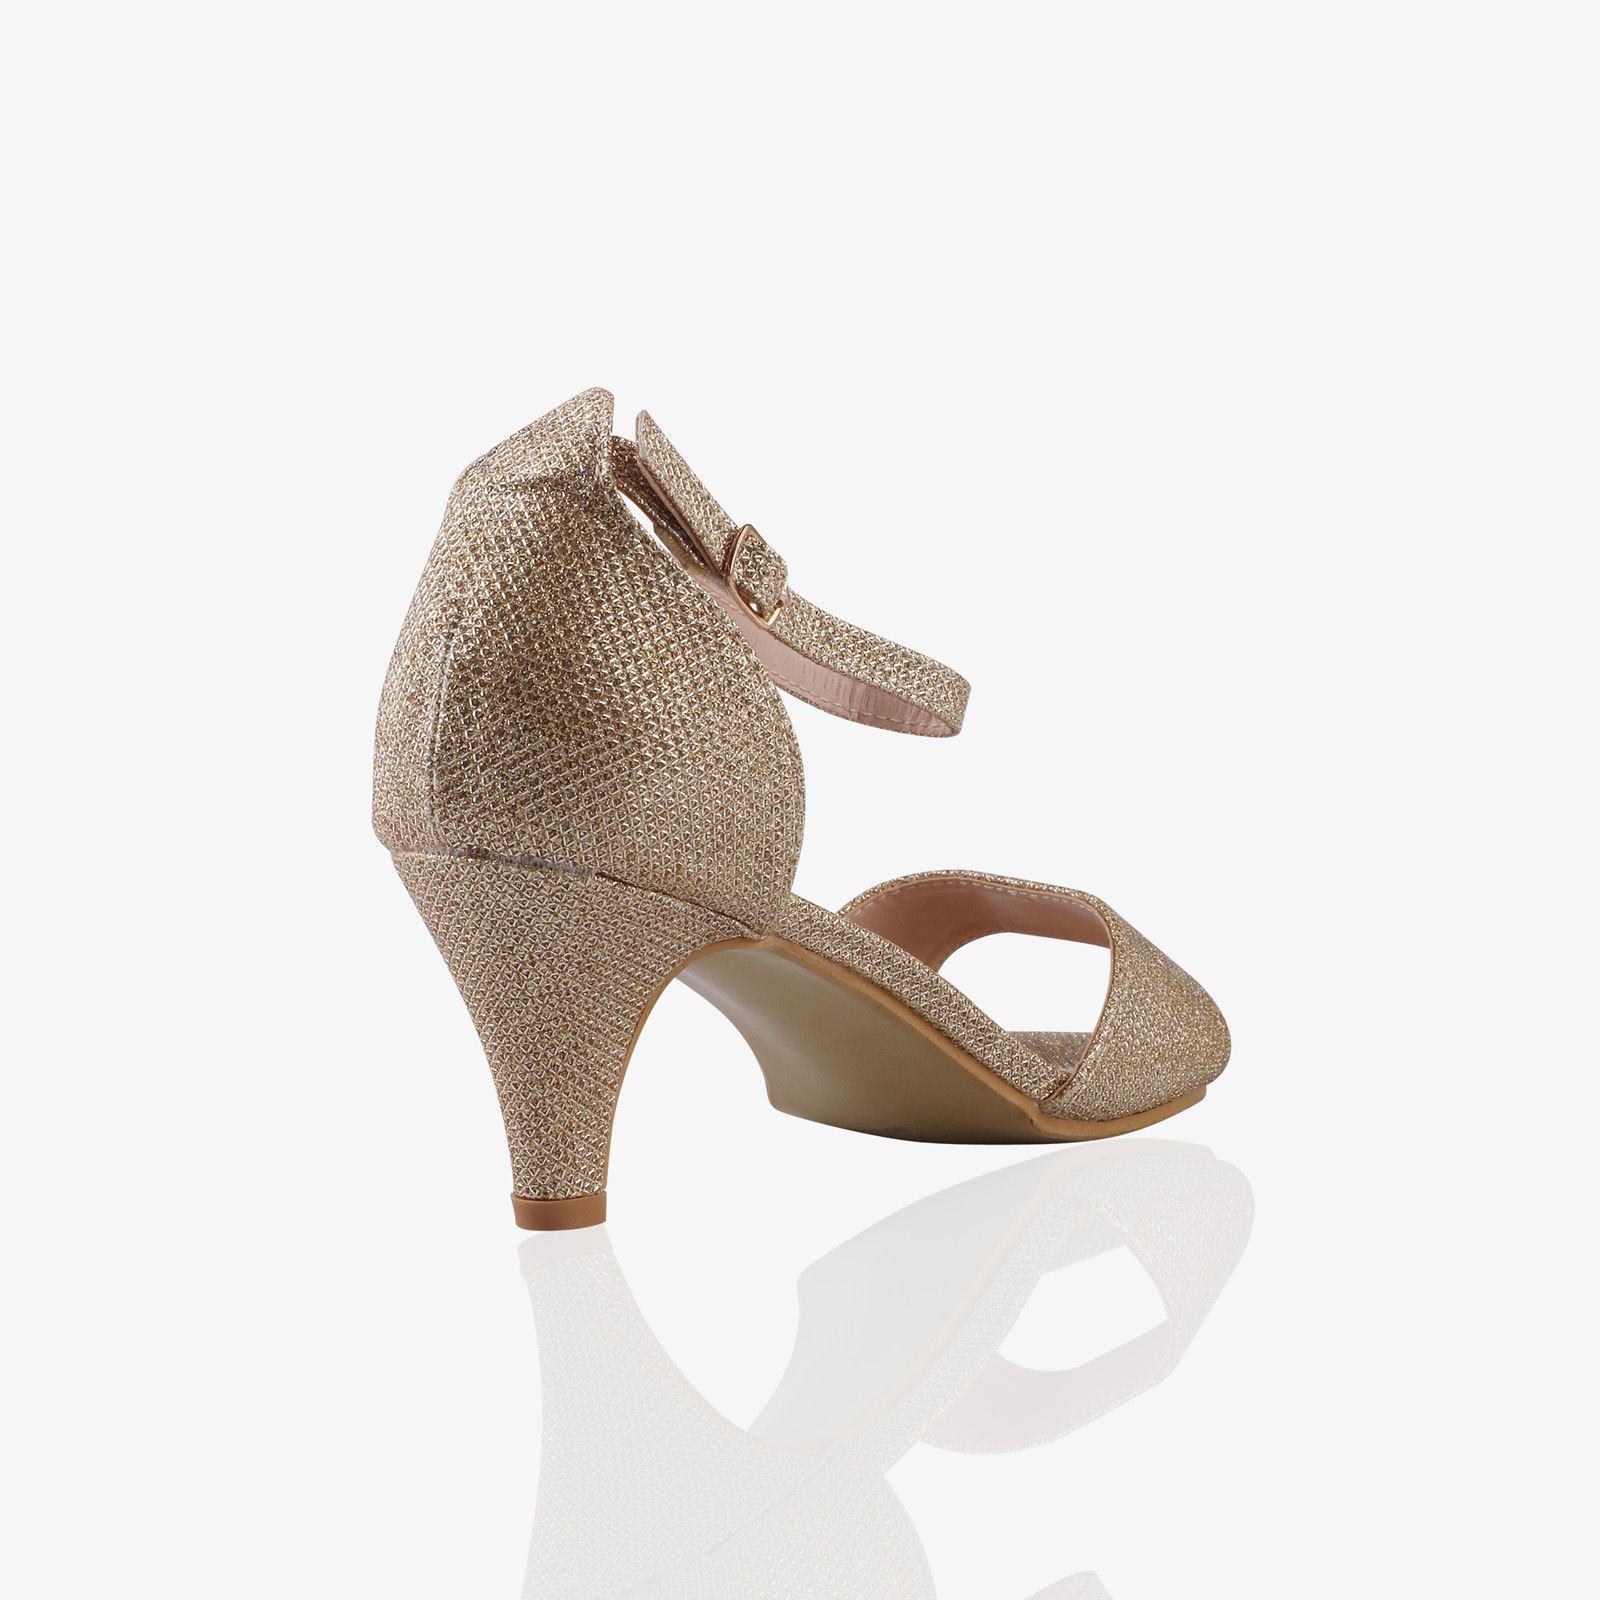 Women-Ladies-Low-Kitten-Heel-Court-Shoes-Open-Toe-Glitter-Sandals-Party-Bridal thumbnail 10